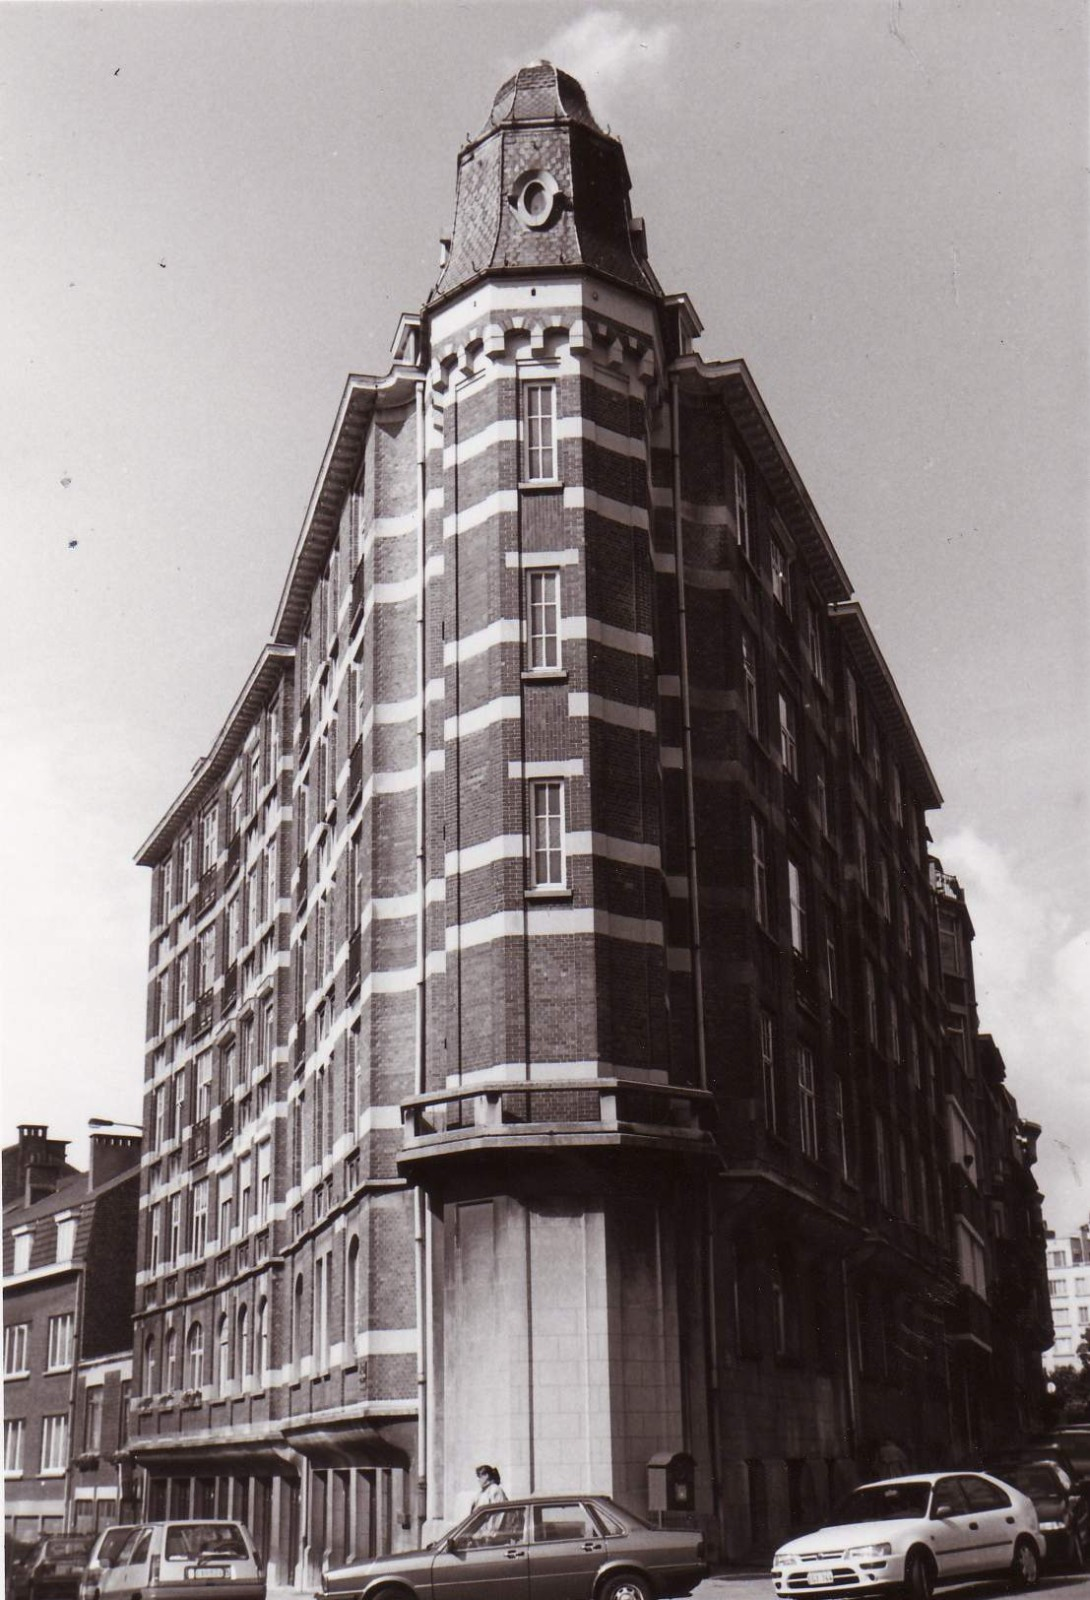 Rue Abbé Cuypers 21-23., 1993